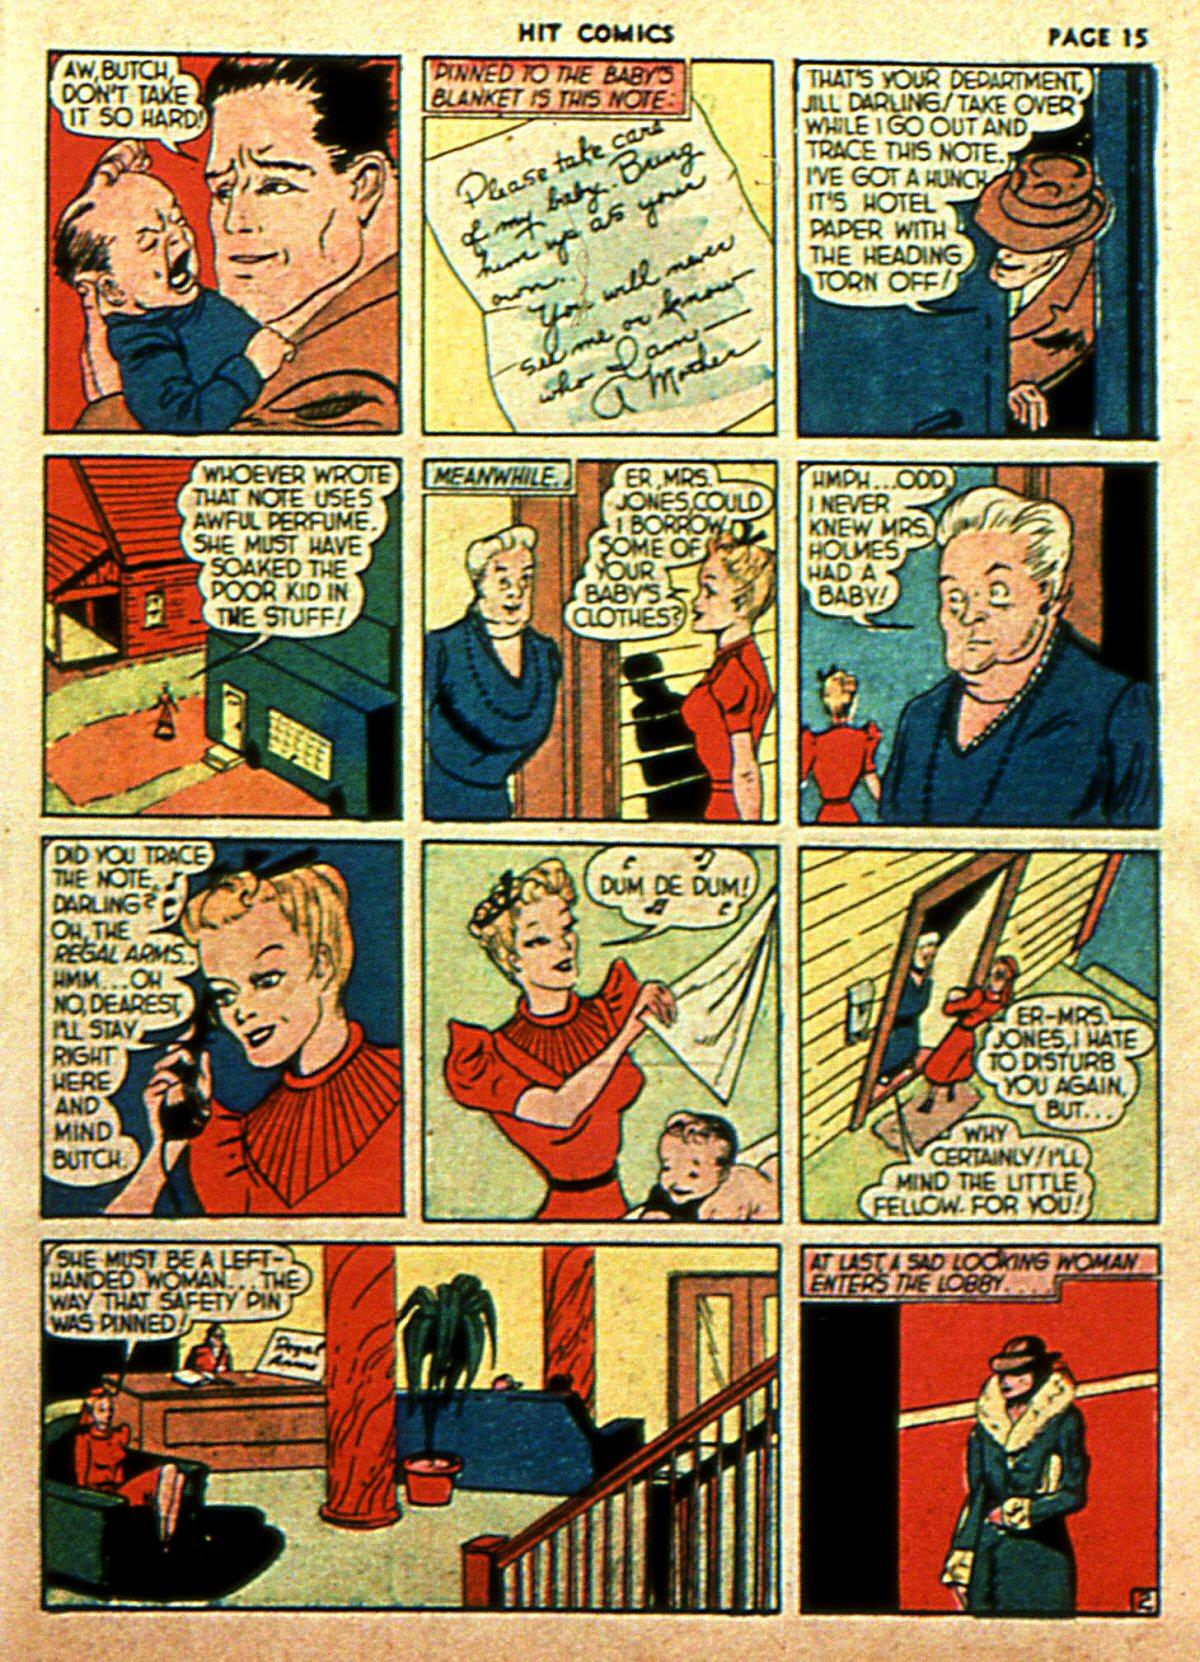 Read online Hit Comics comic -  Issue #2 - 17